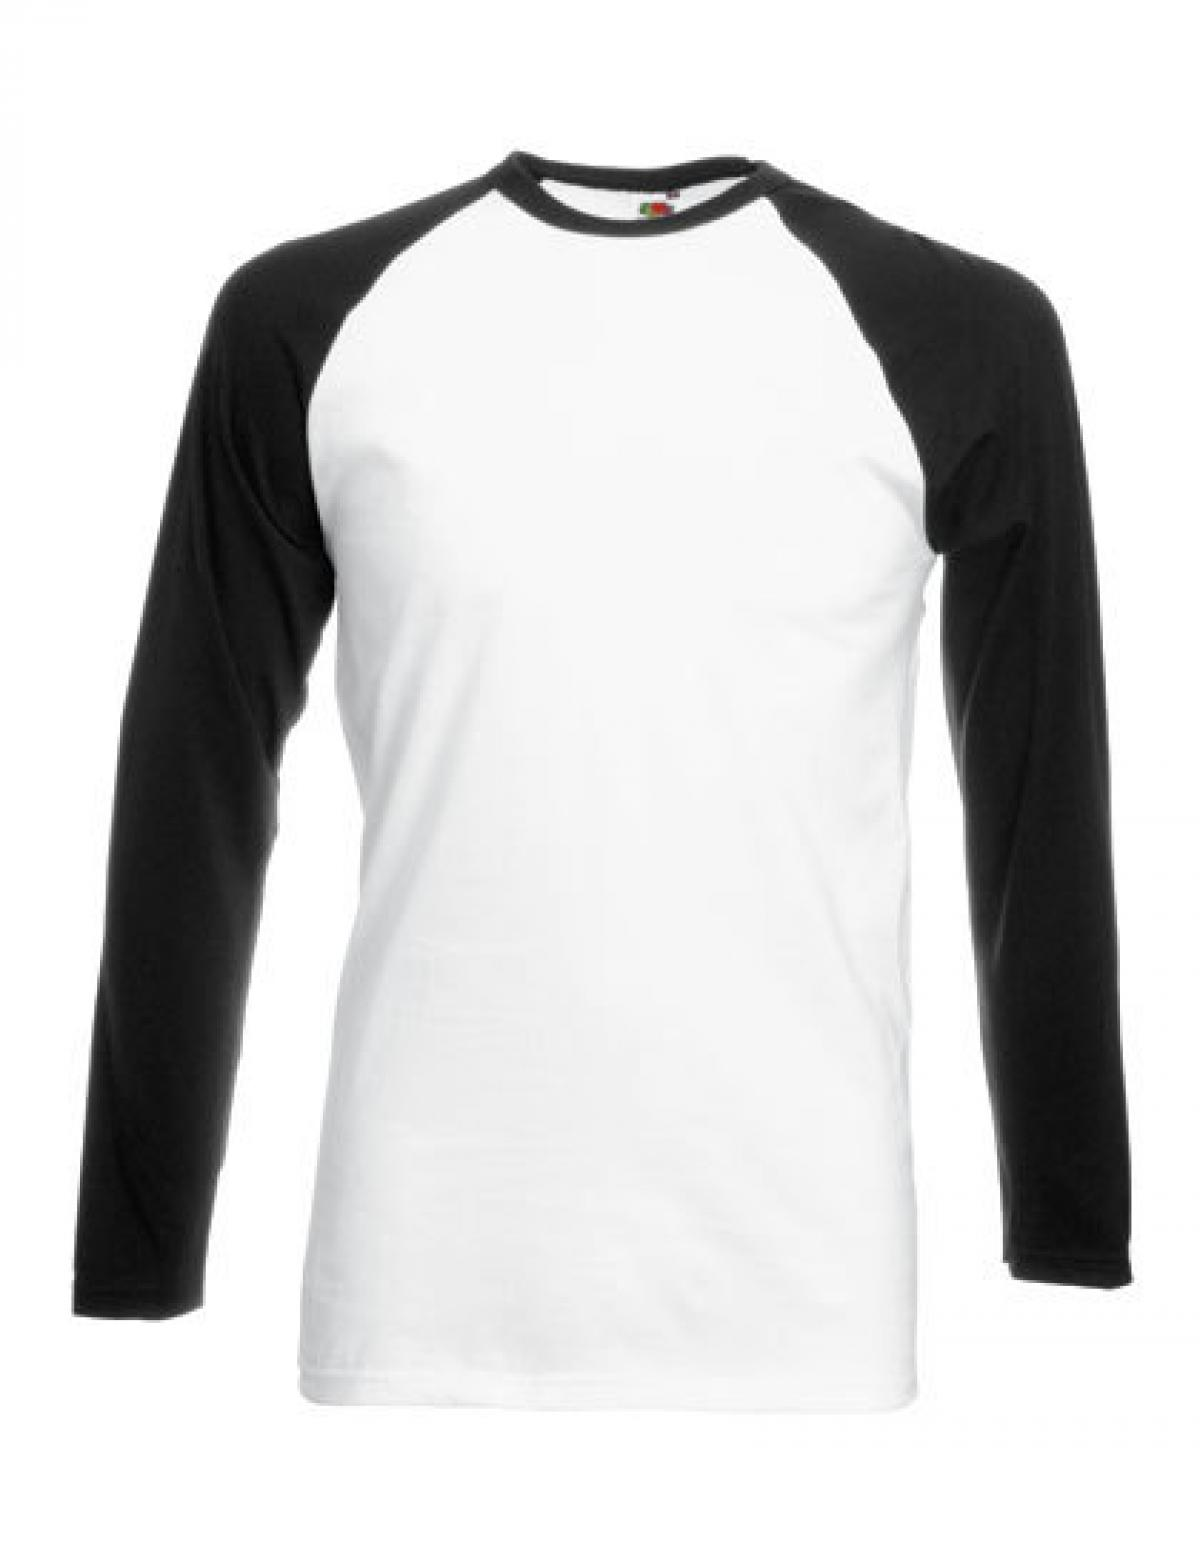 long sleeve baseball herren t shirt rexlander s. Black Bedroom Furniture Sets. Home Design Ideas